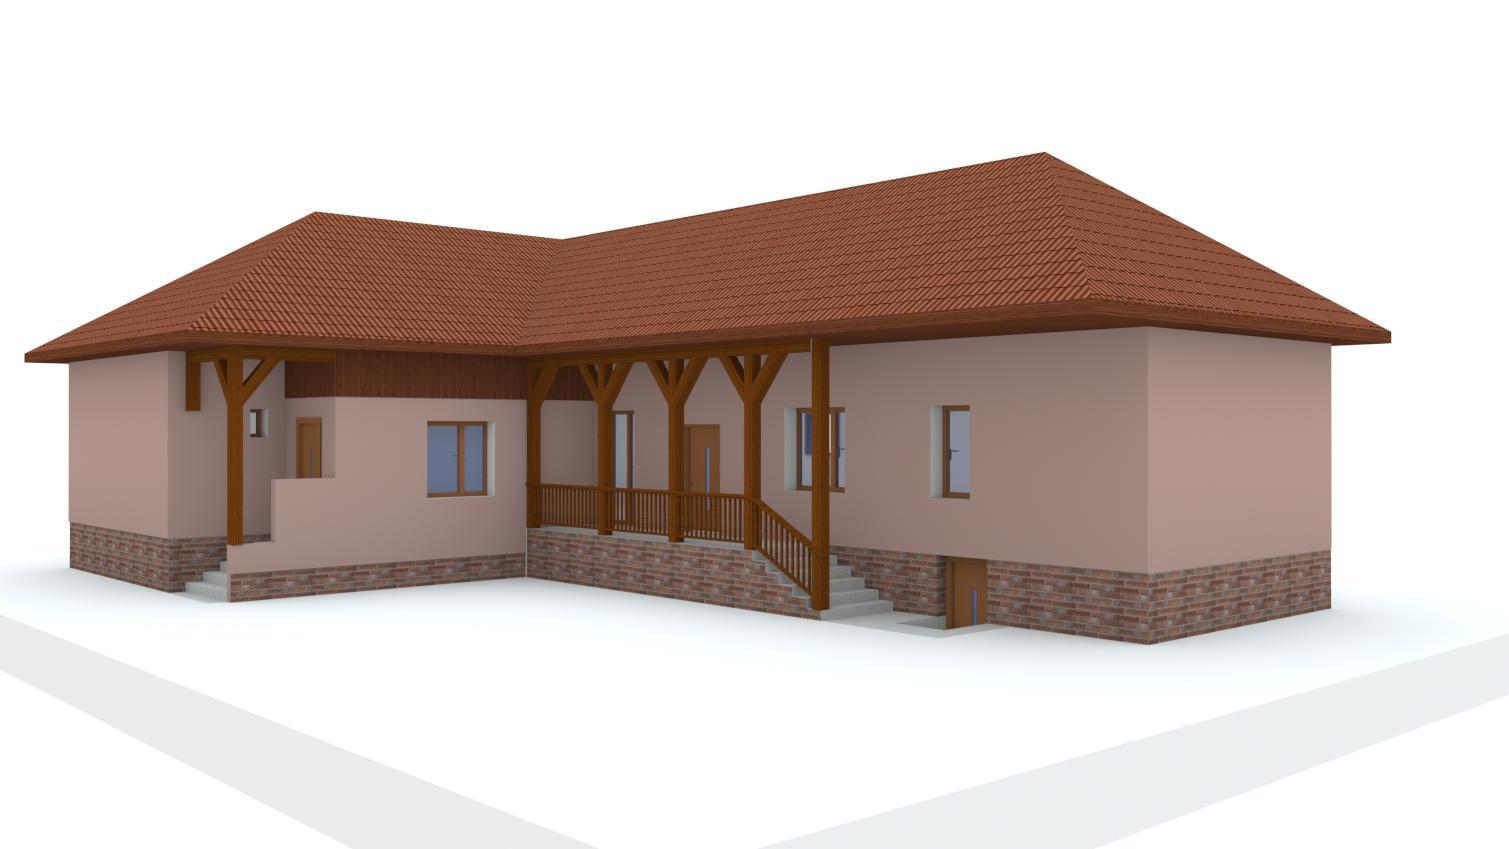 Návrh fasády rodinného domu - Obrázok č. 4